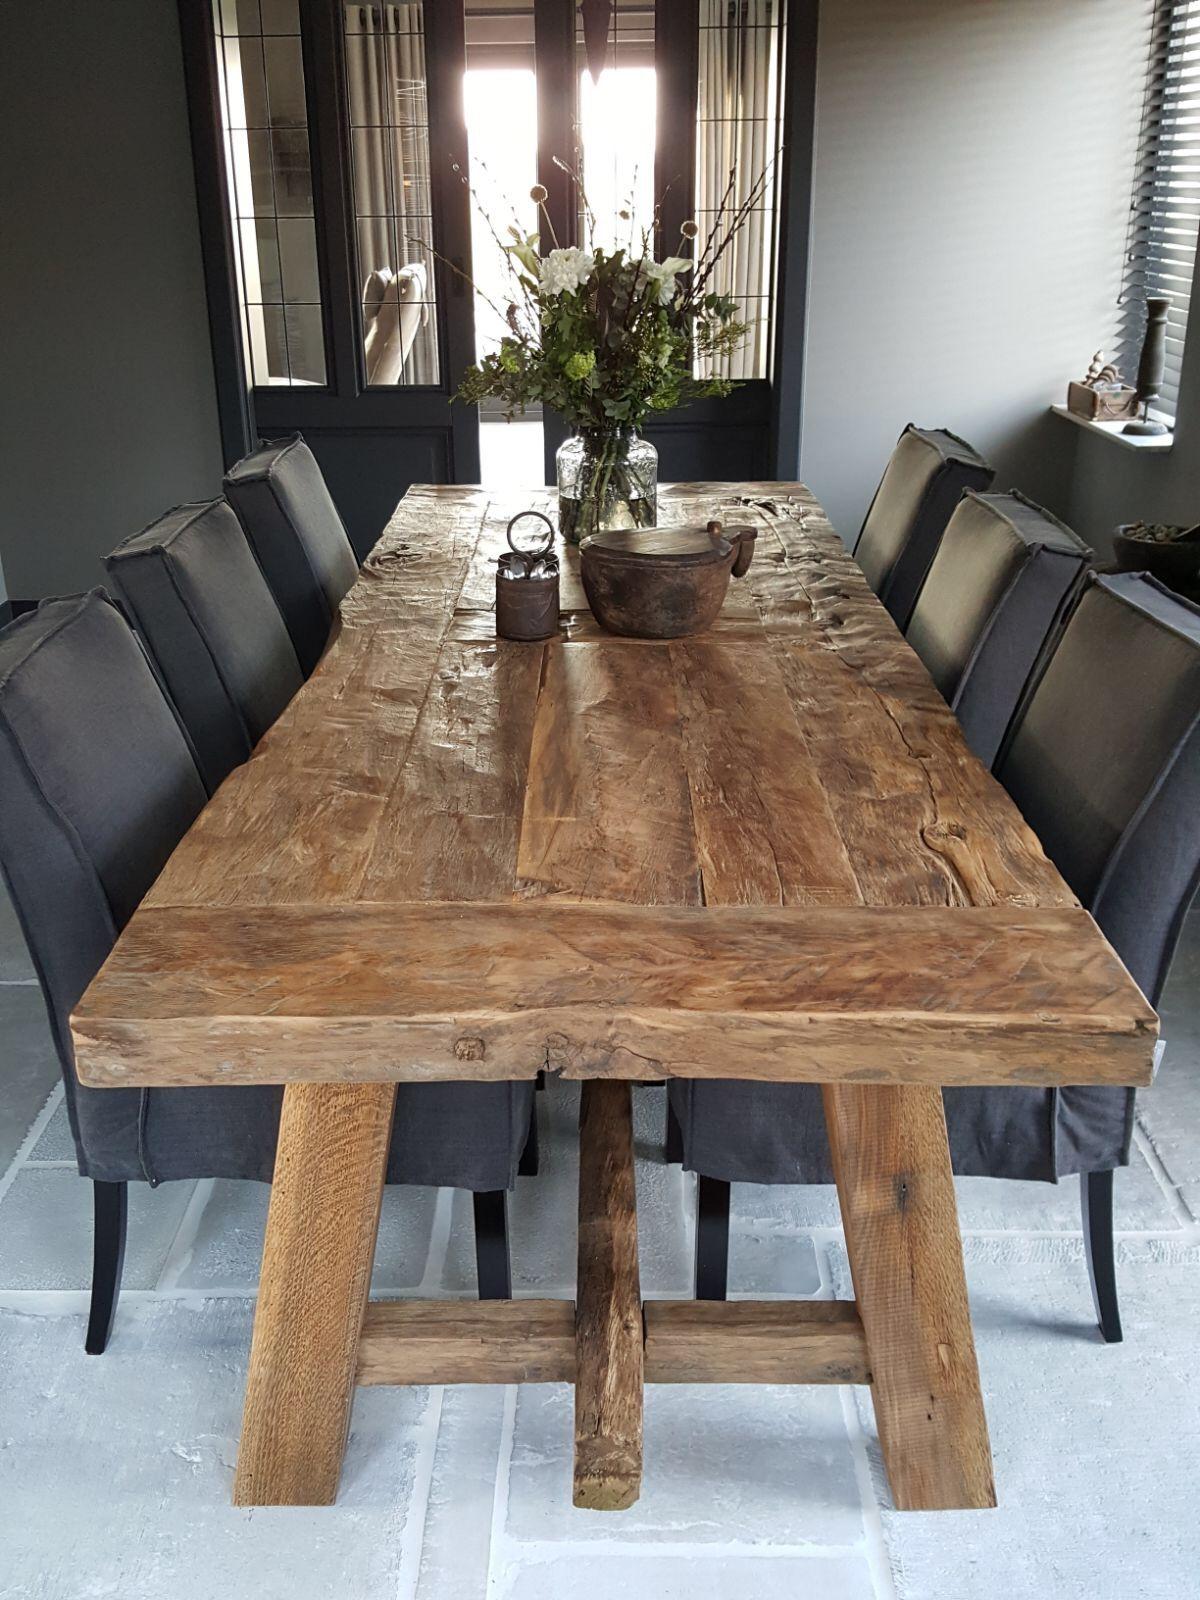 Zwaar Eiken Eettafel.Oud Eiken Tafel Inrichting Casa Cuerda In 2019 Table Dining